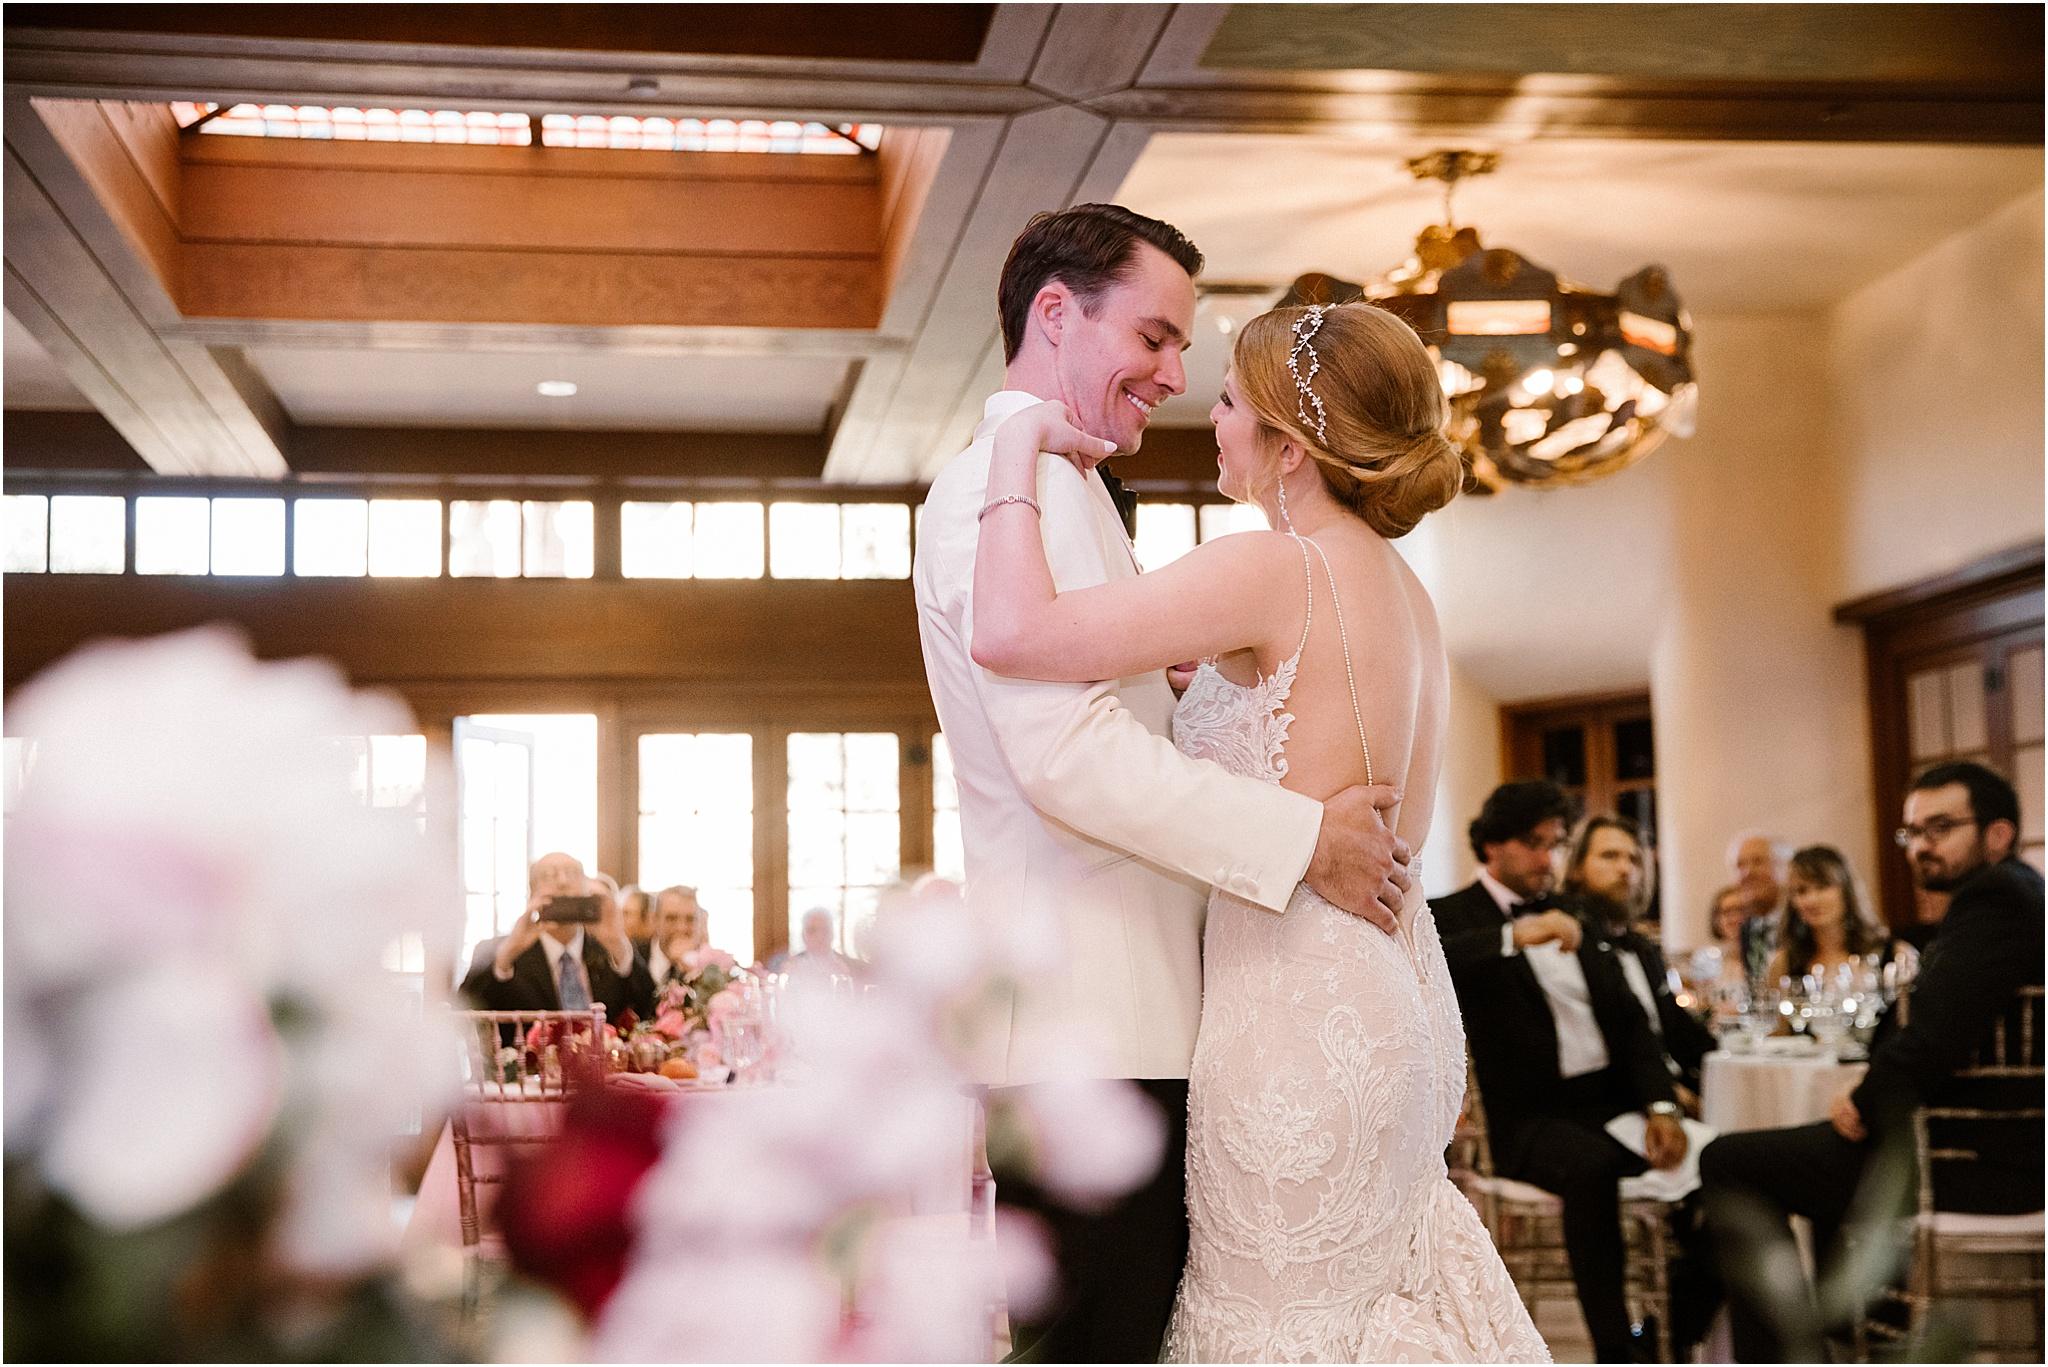 BLUE ROSE PHOTOGRAPHY SANTA FE WEDDING_46